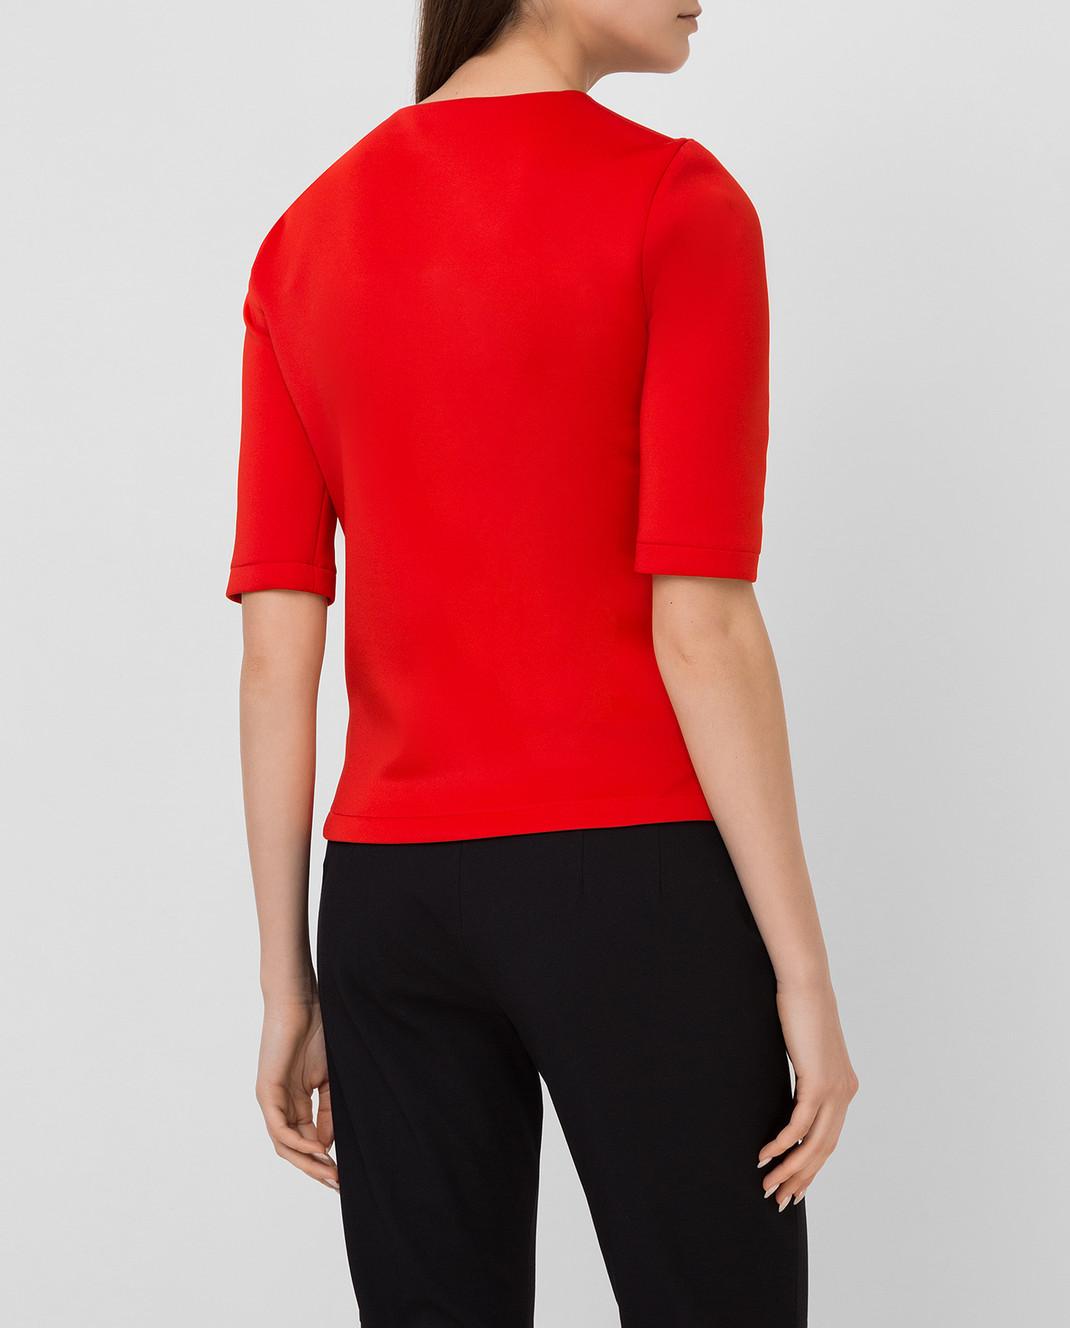 Bottega Veneta Красная футболка 405392 изображение 4